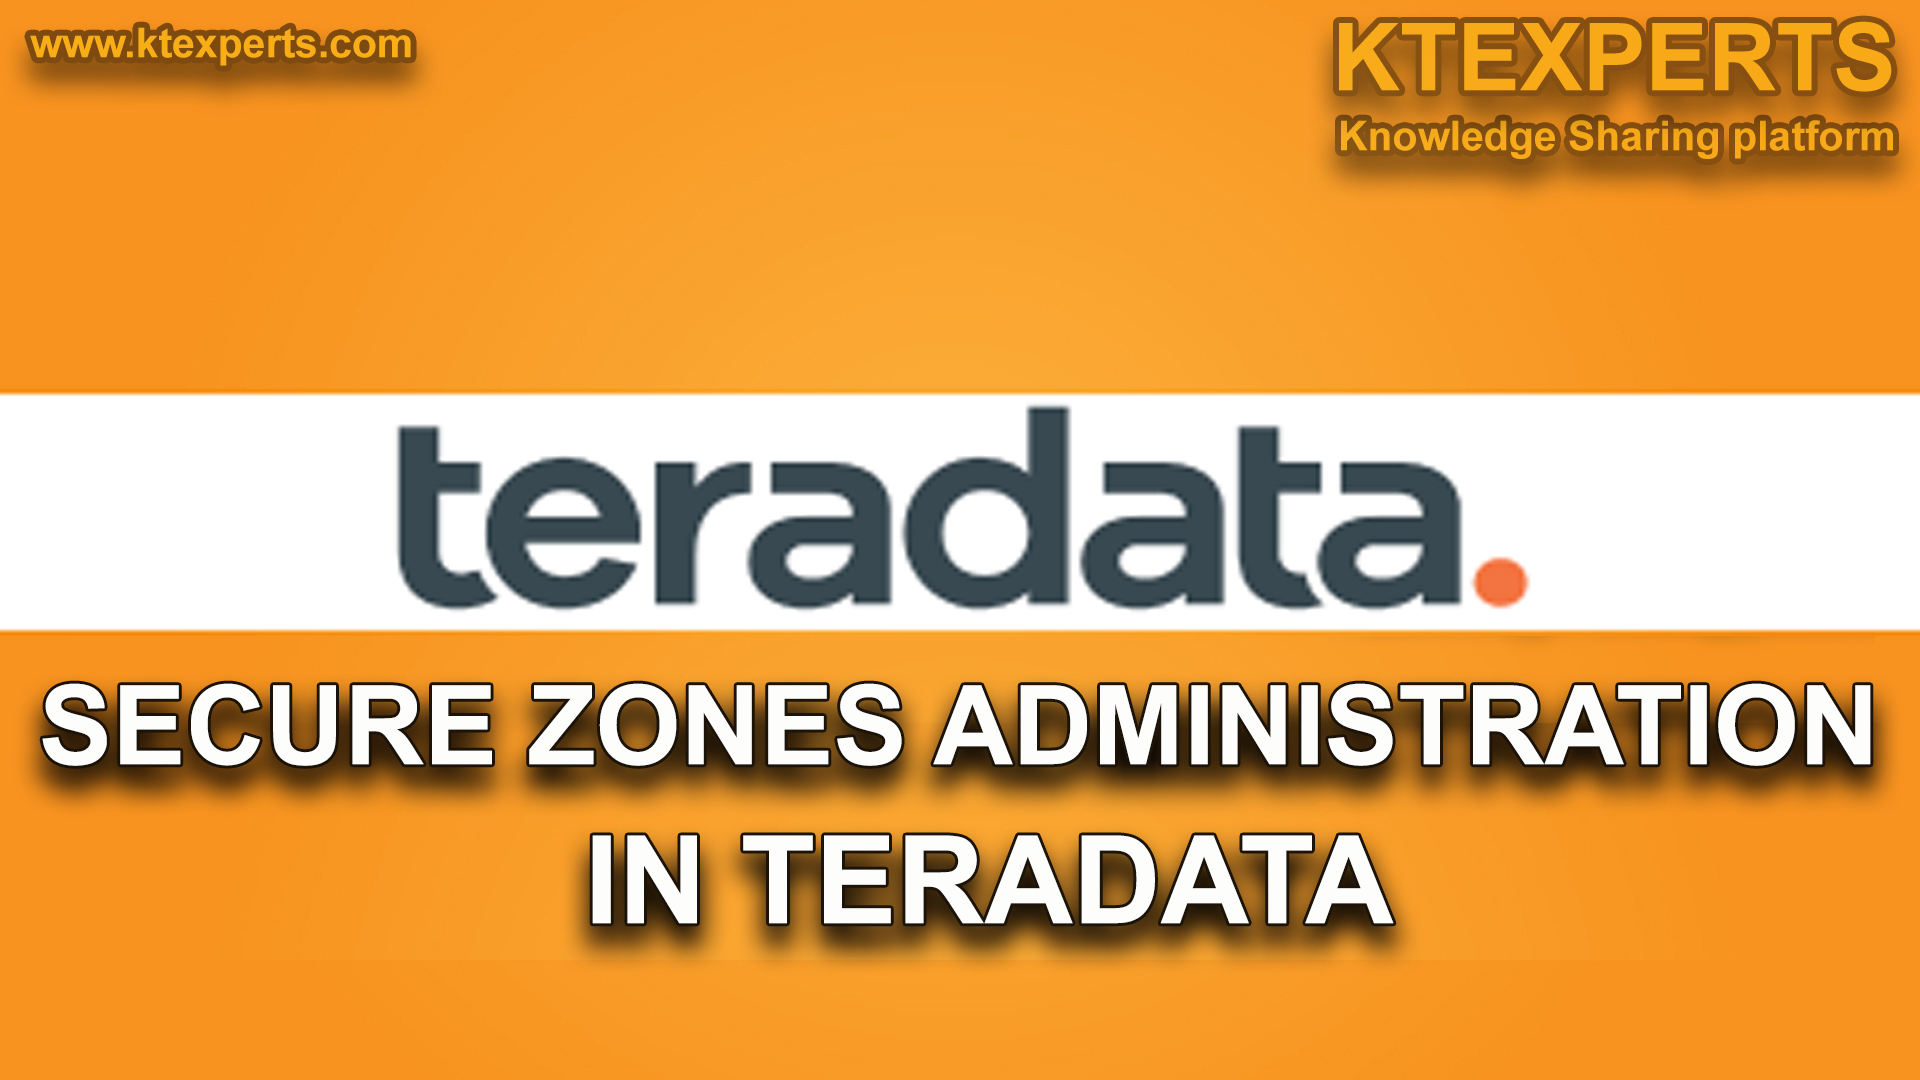 SECURE ZONES ADMINISTRATION IN TERADATA